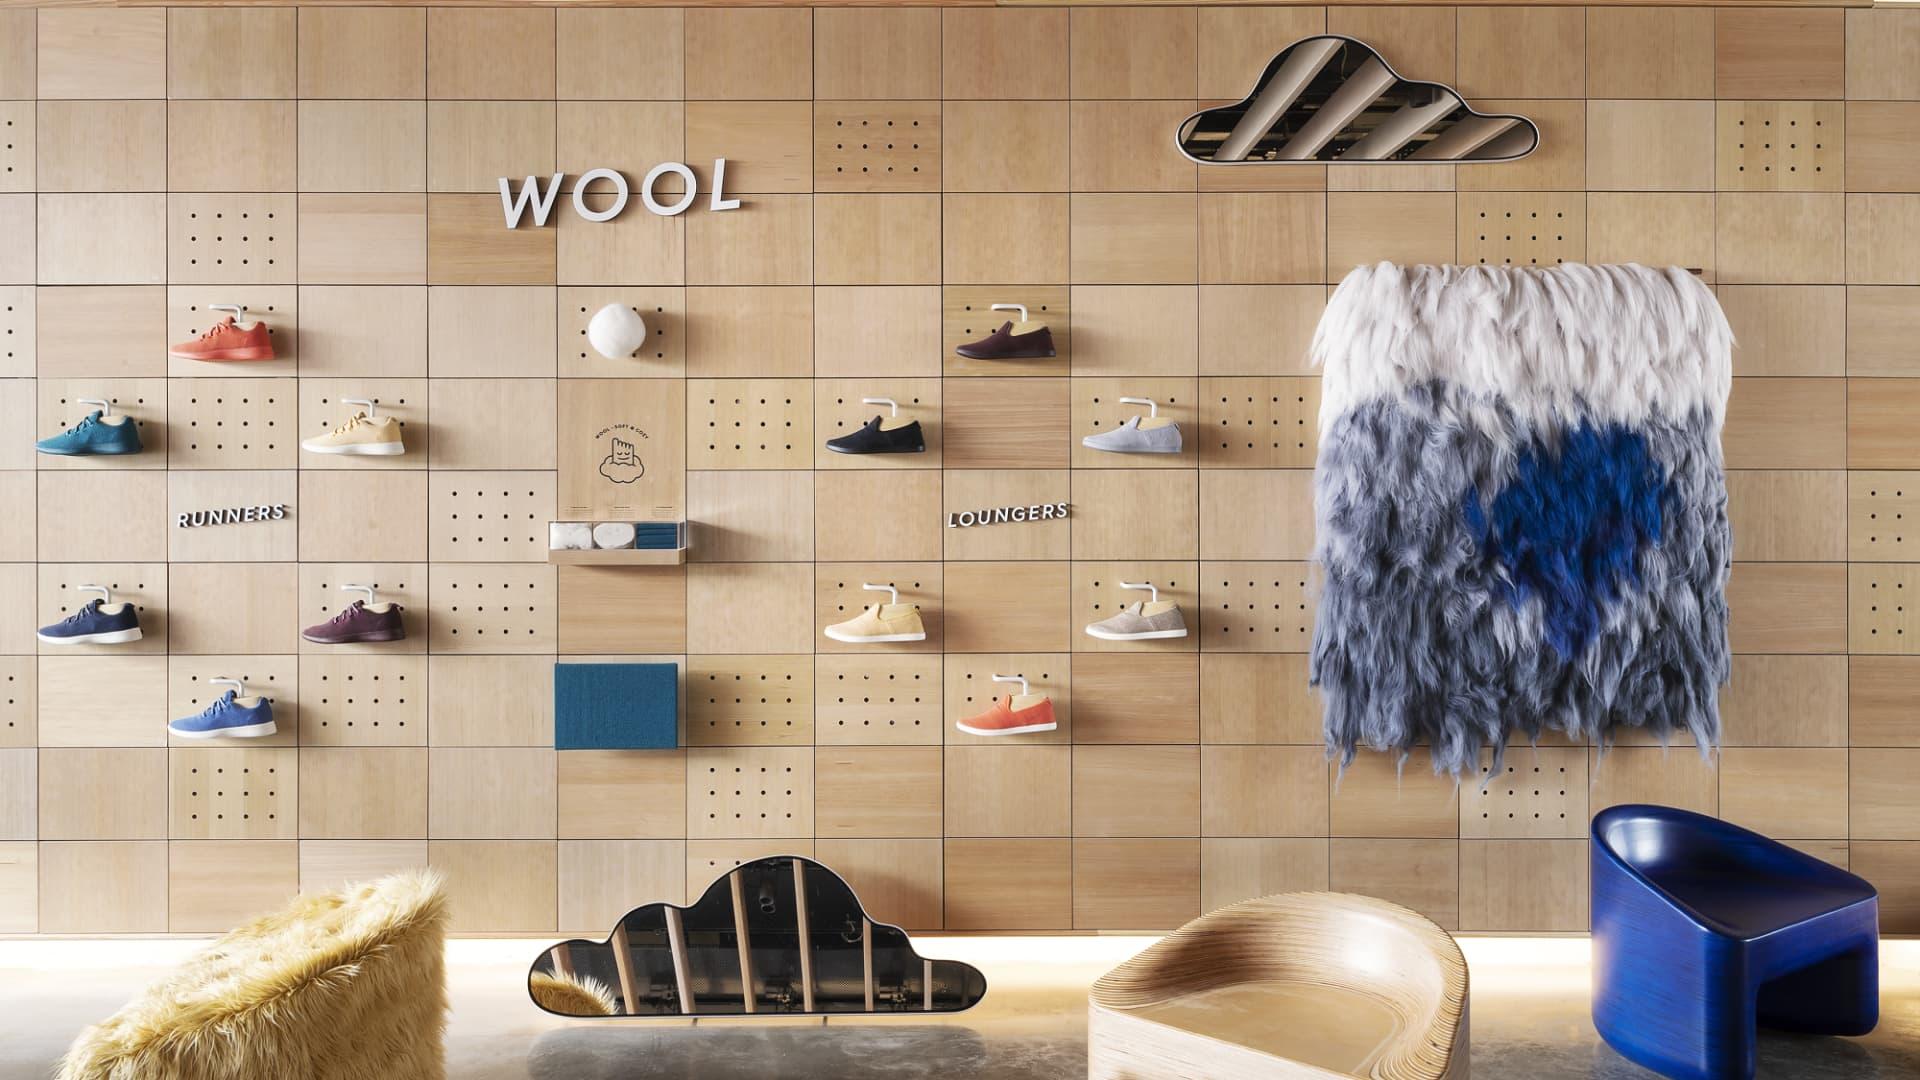 Allbirds' New York City retail store is located in Manhattan's trendy SoHo neighborhood.